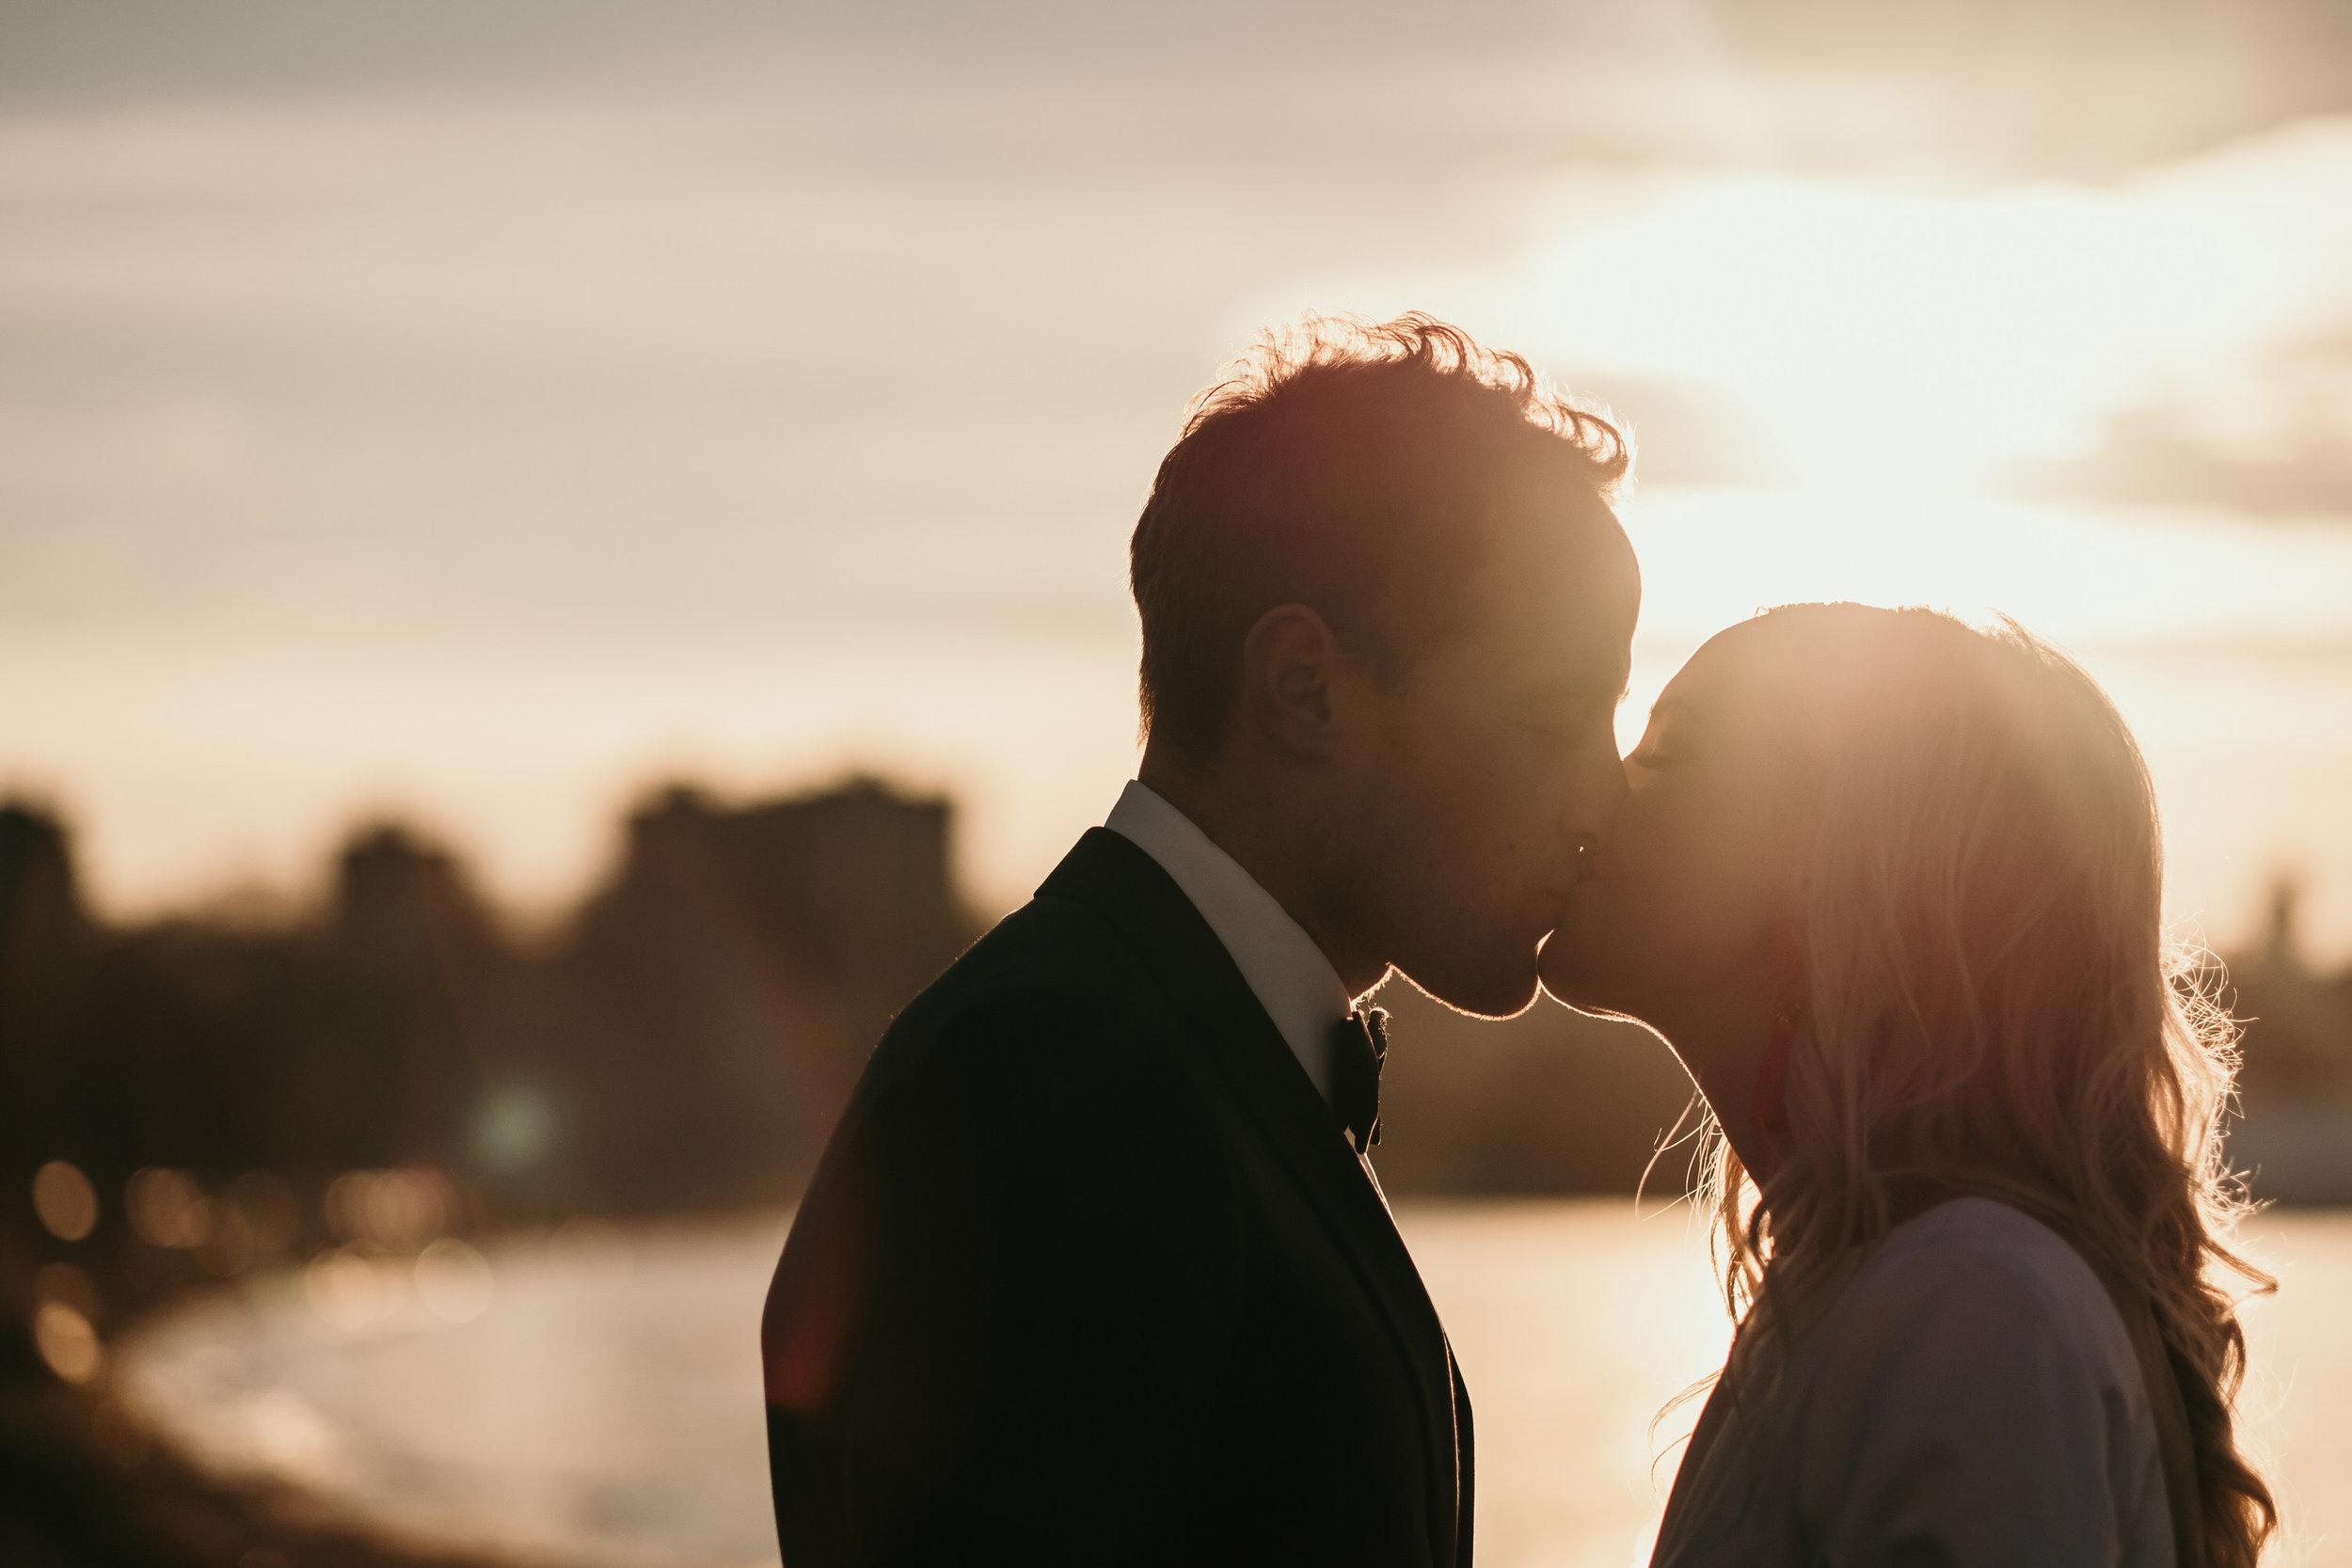 Vancouver Wedding Photos - Vegan Wedding Photographer - New Years Eve Wedding Photos - Vancouver Wedding Photographer - Vancouver Wedding Videographer - 759.JPG